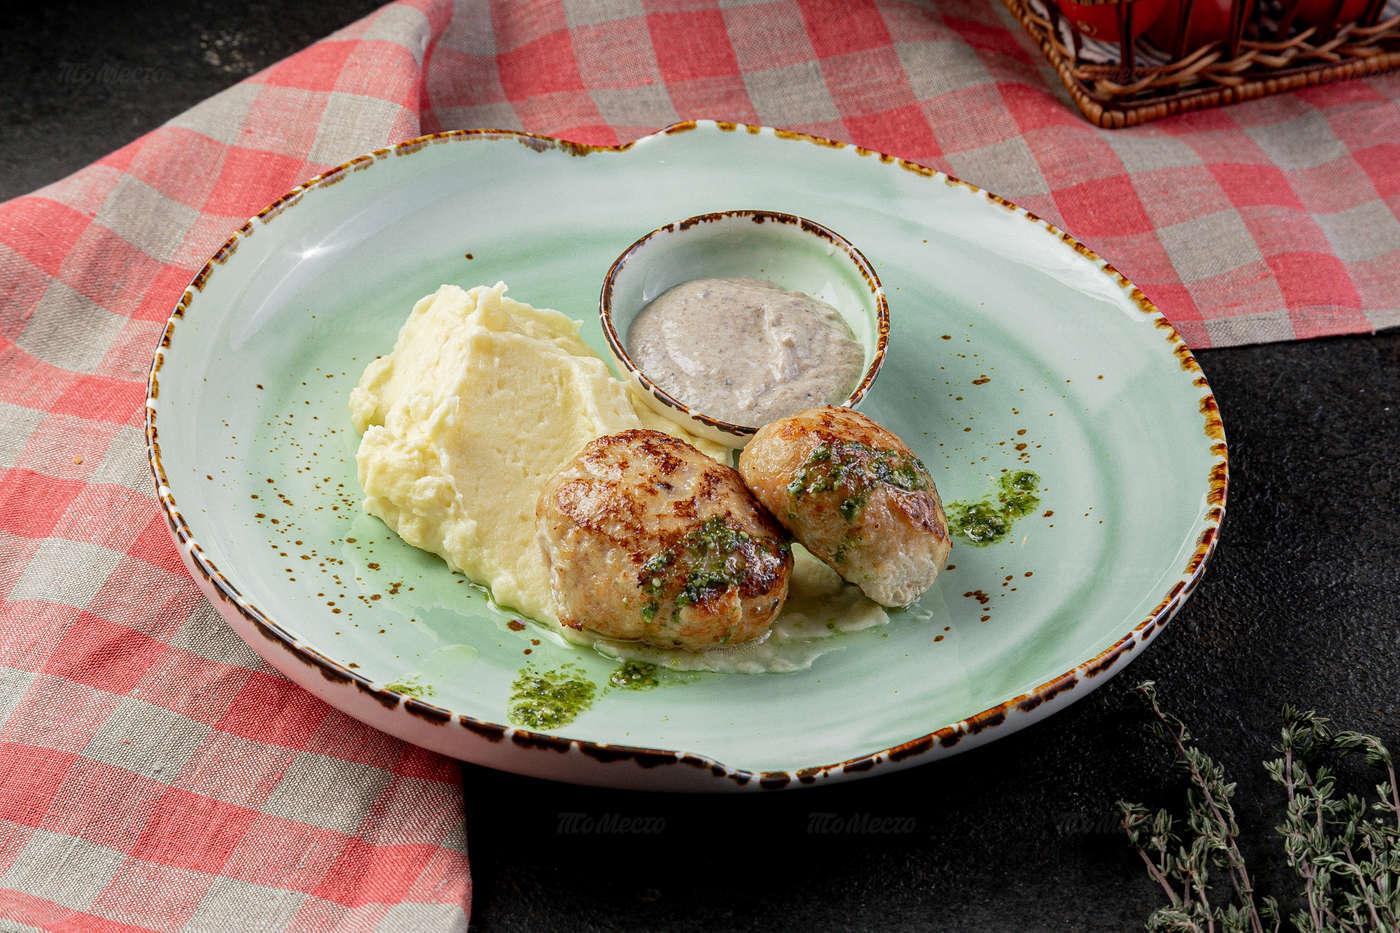 Меню ресторана Папа Пицциано (Papa Pizziano) на Новочеркасском проспекте фото 24